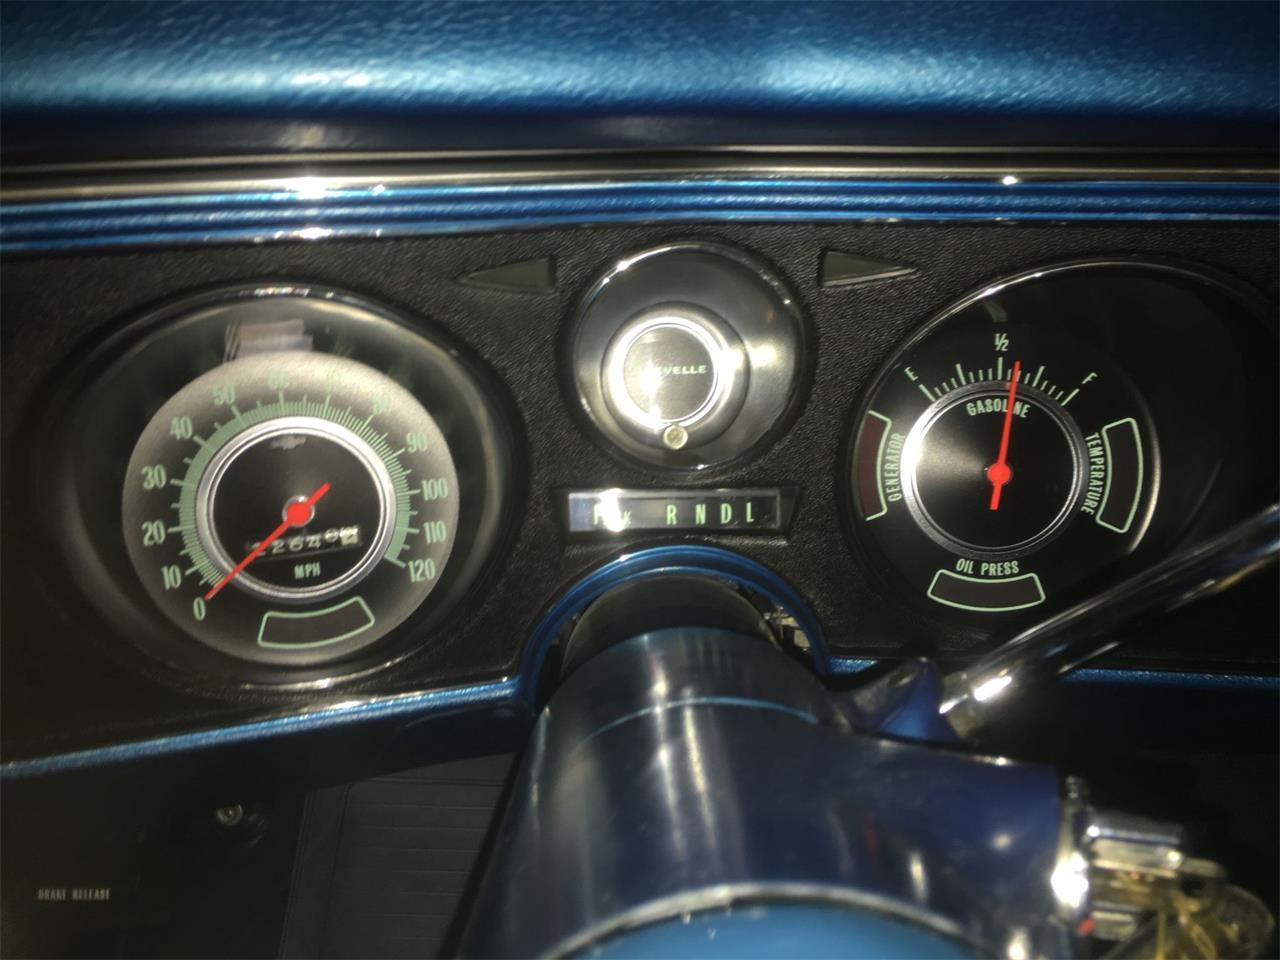 1969 Chevrolet Malibu (CC-1164009) for sale in Annandale, Minnesota